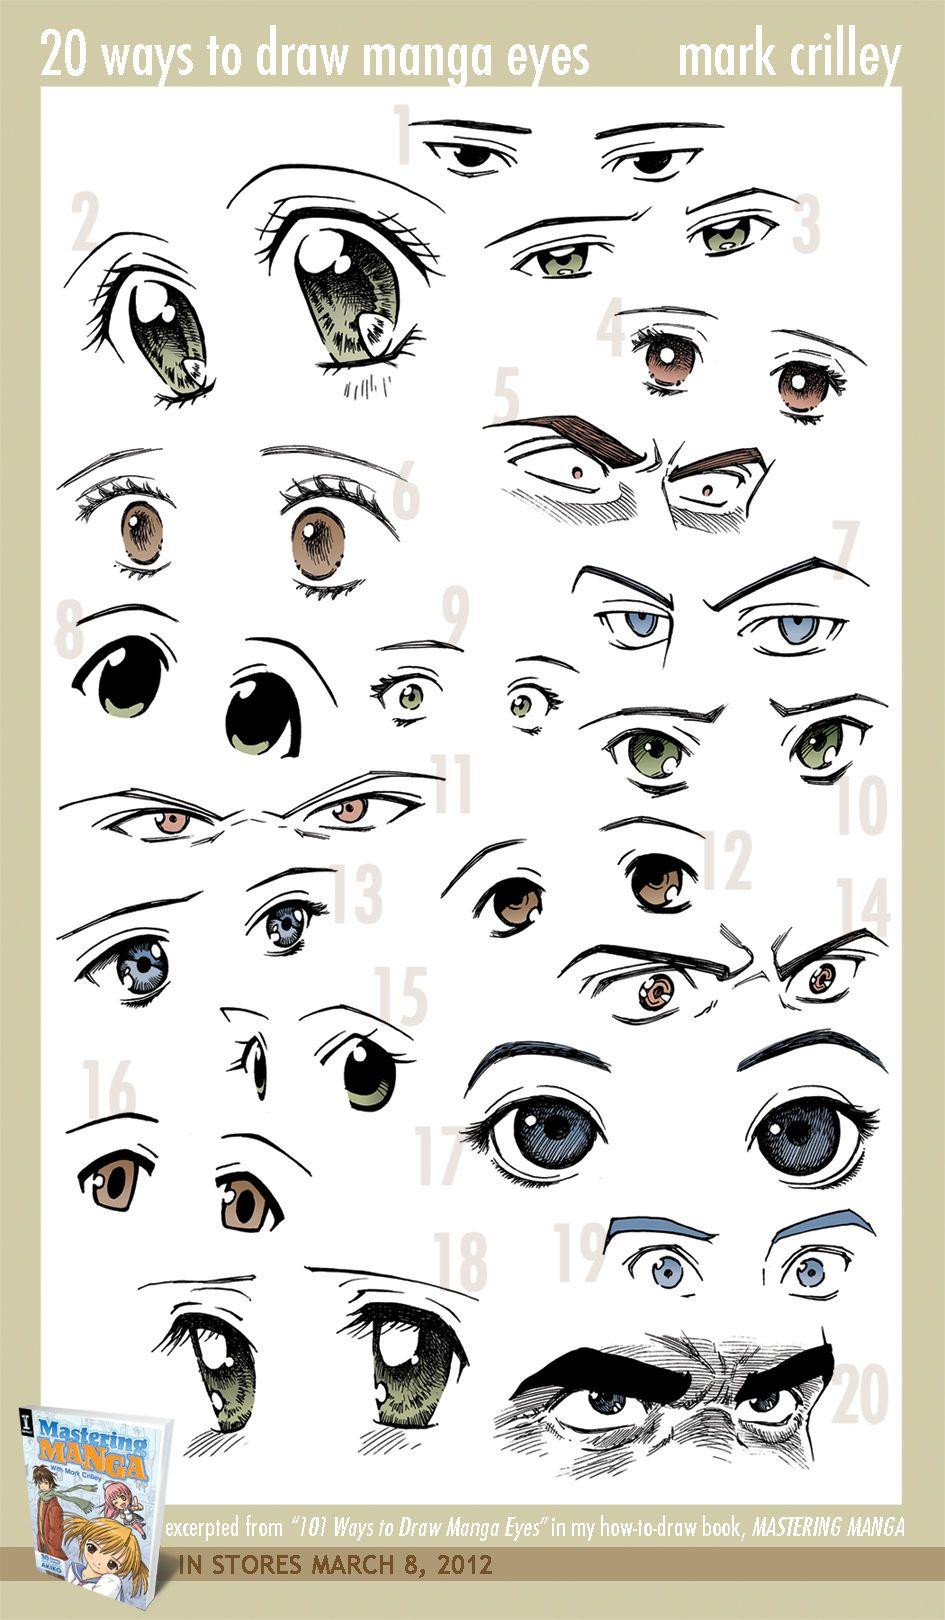 20 Ways to Draw Manga Eyes by